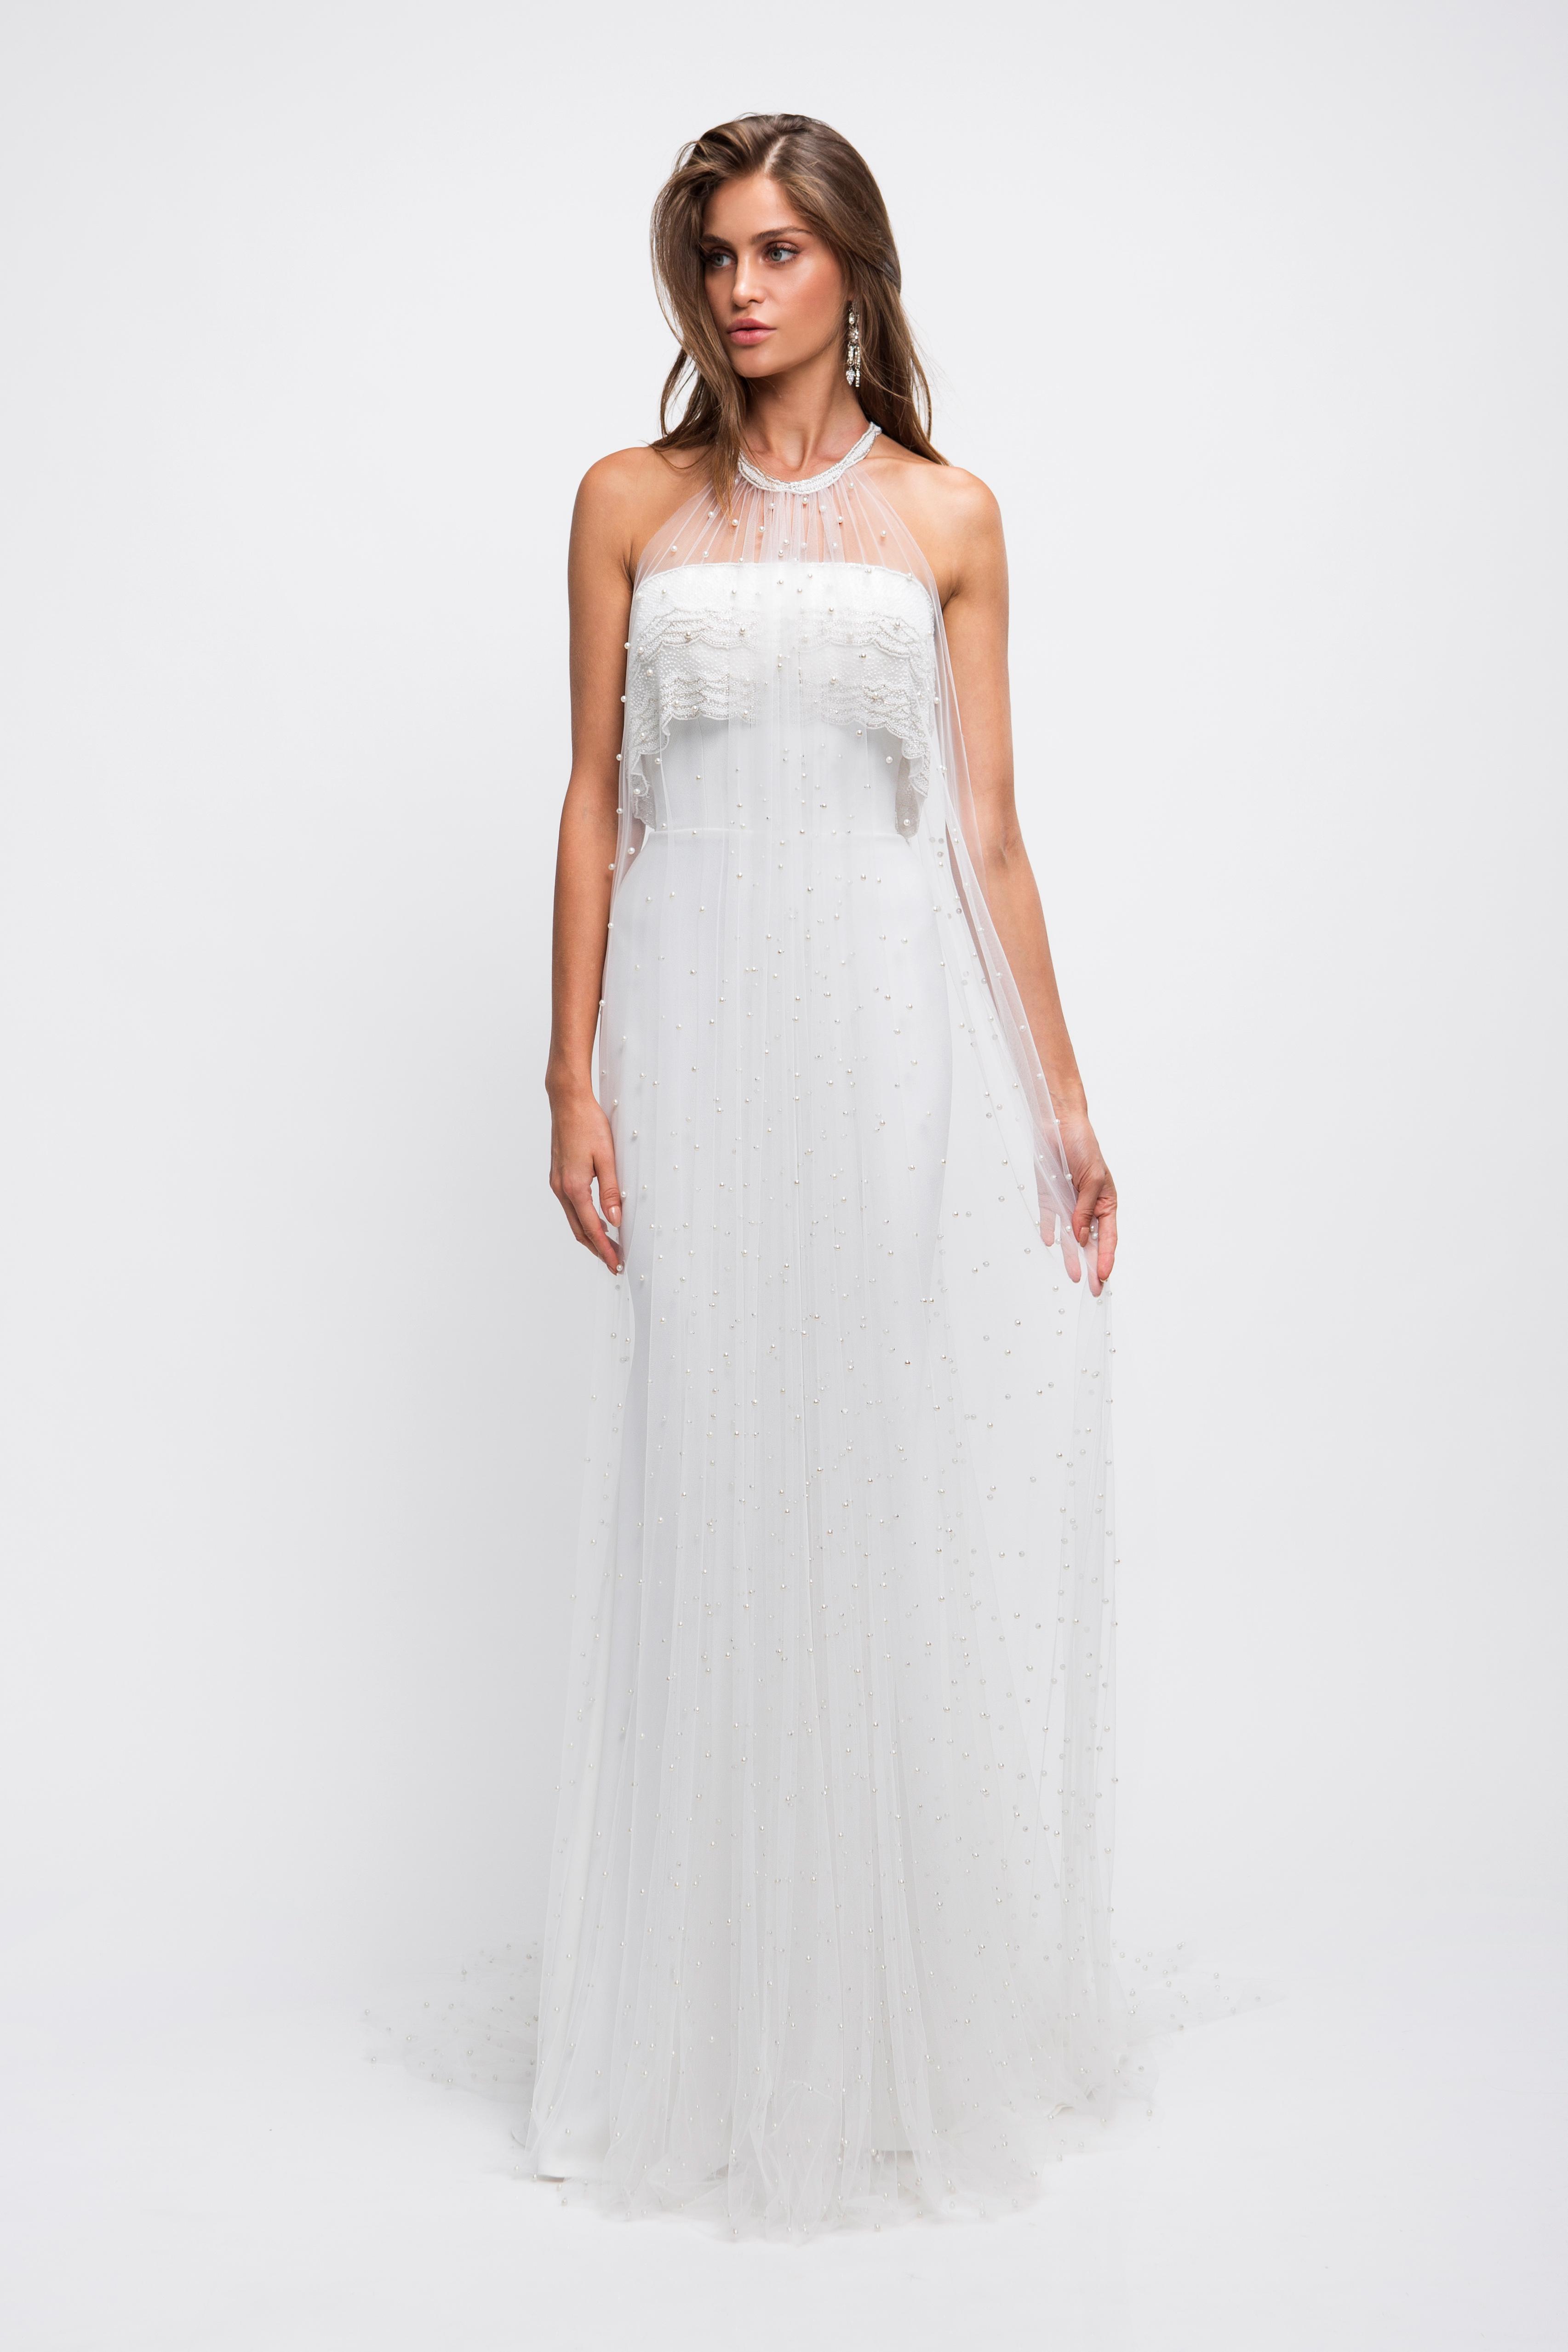 lihi hod wedding dress halter illusion beaded overlay sheath